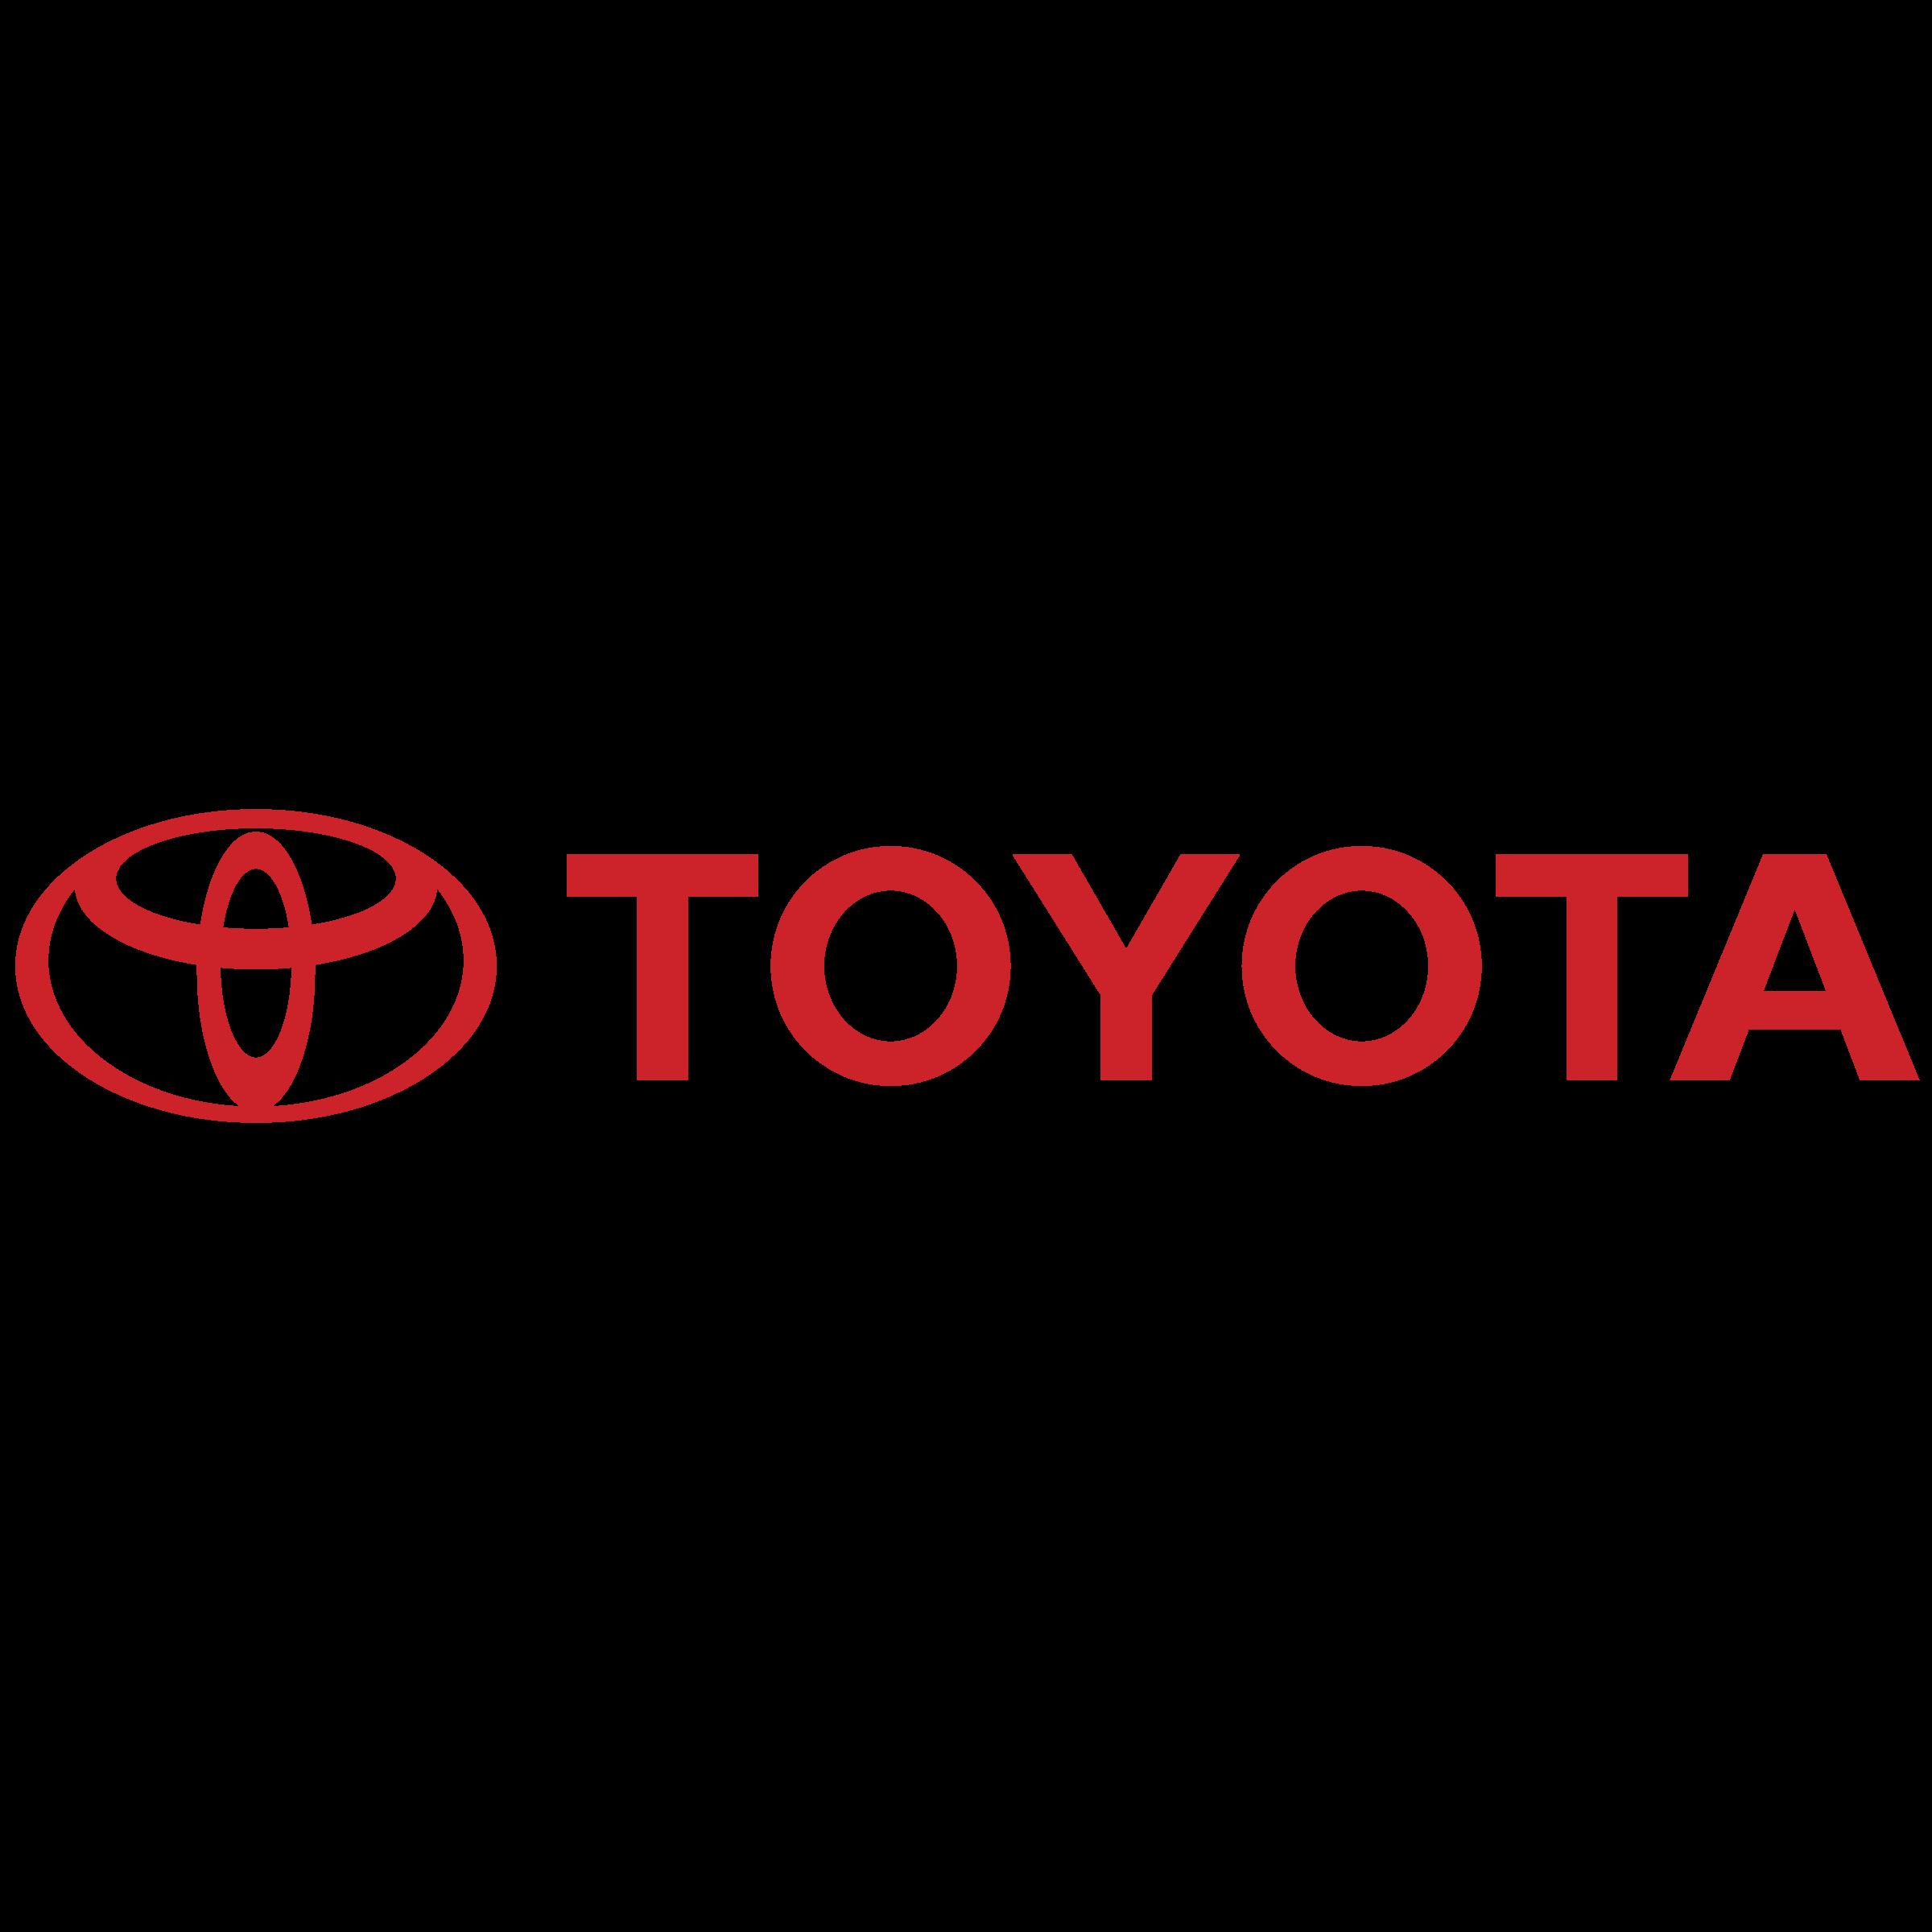 Toyota Logo PNG Transparent & SVG Vector - Freebie Supply